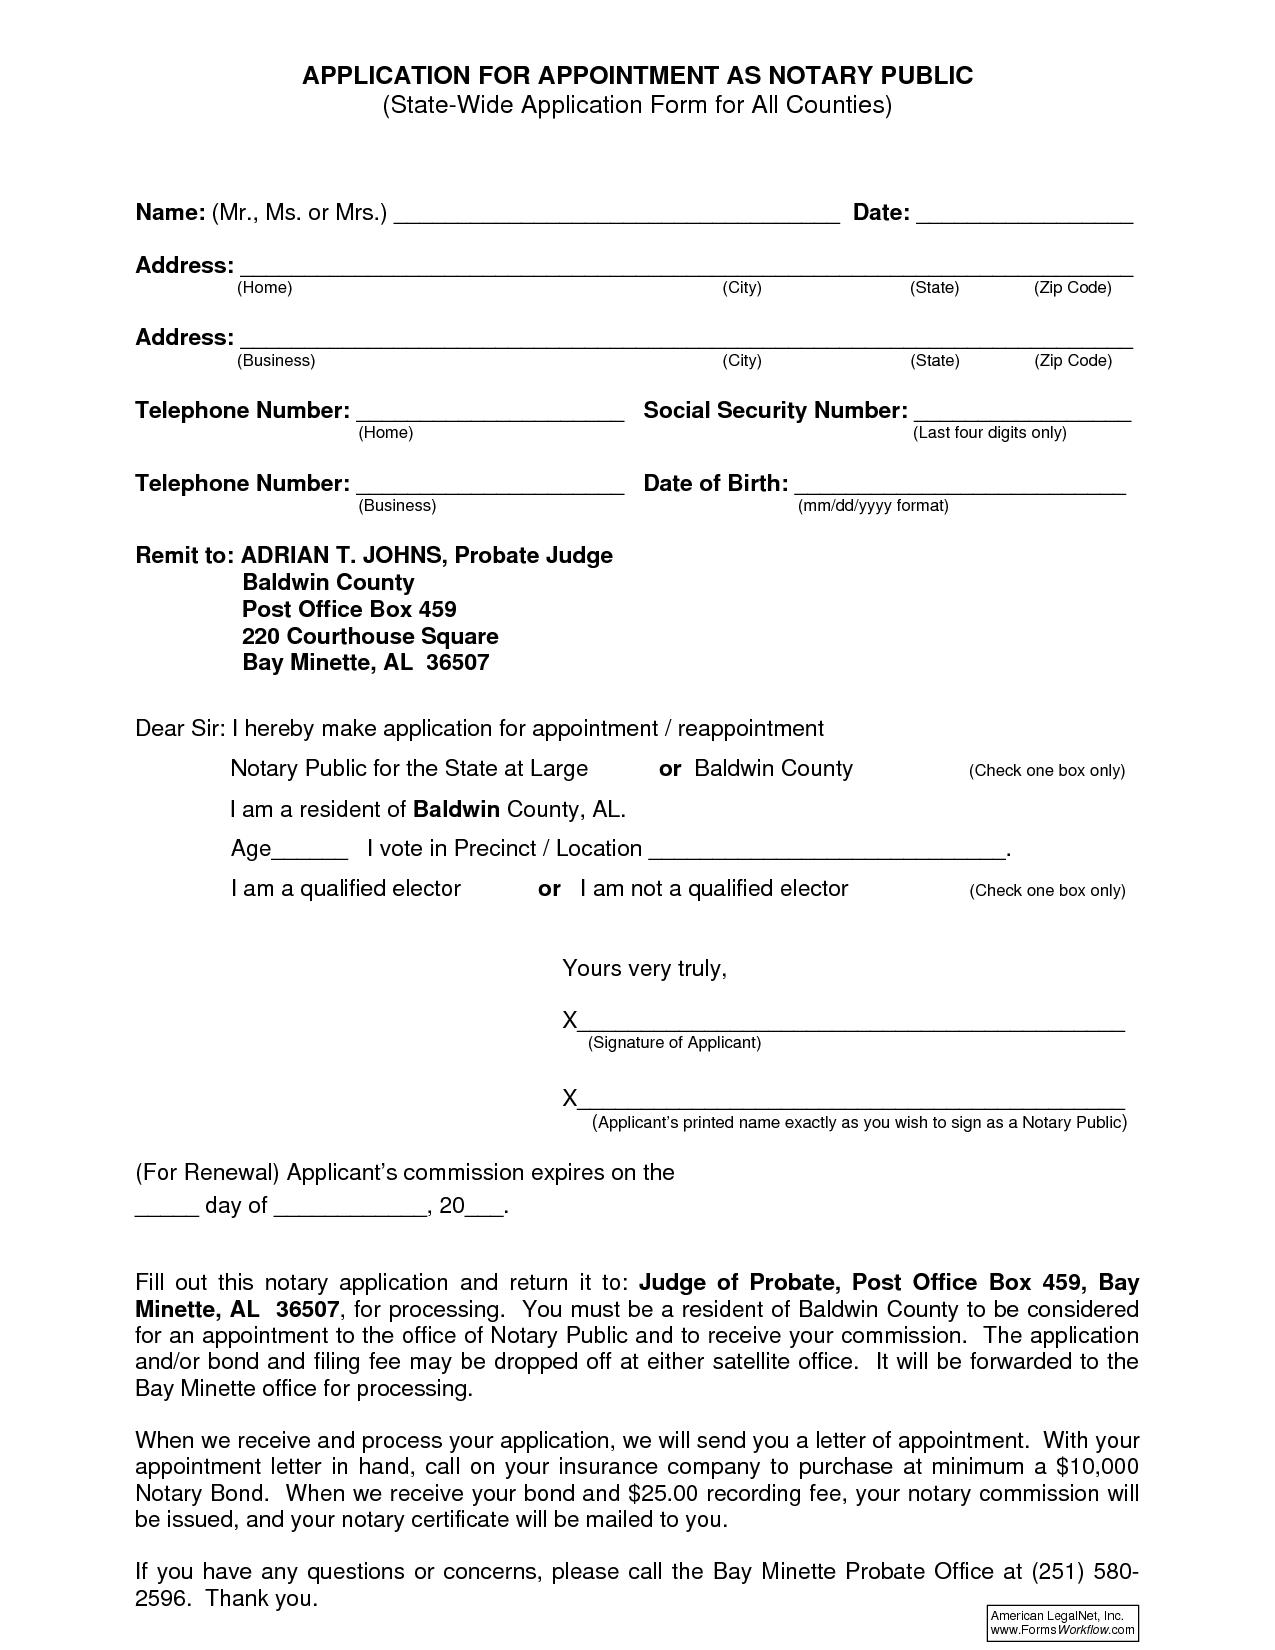 Notary Public Application Form Alabama